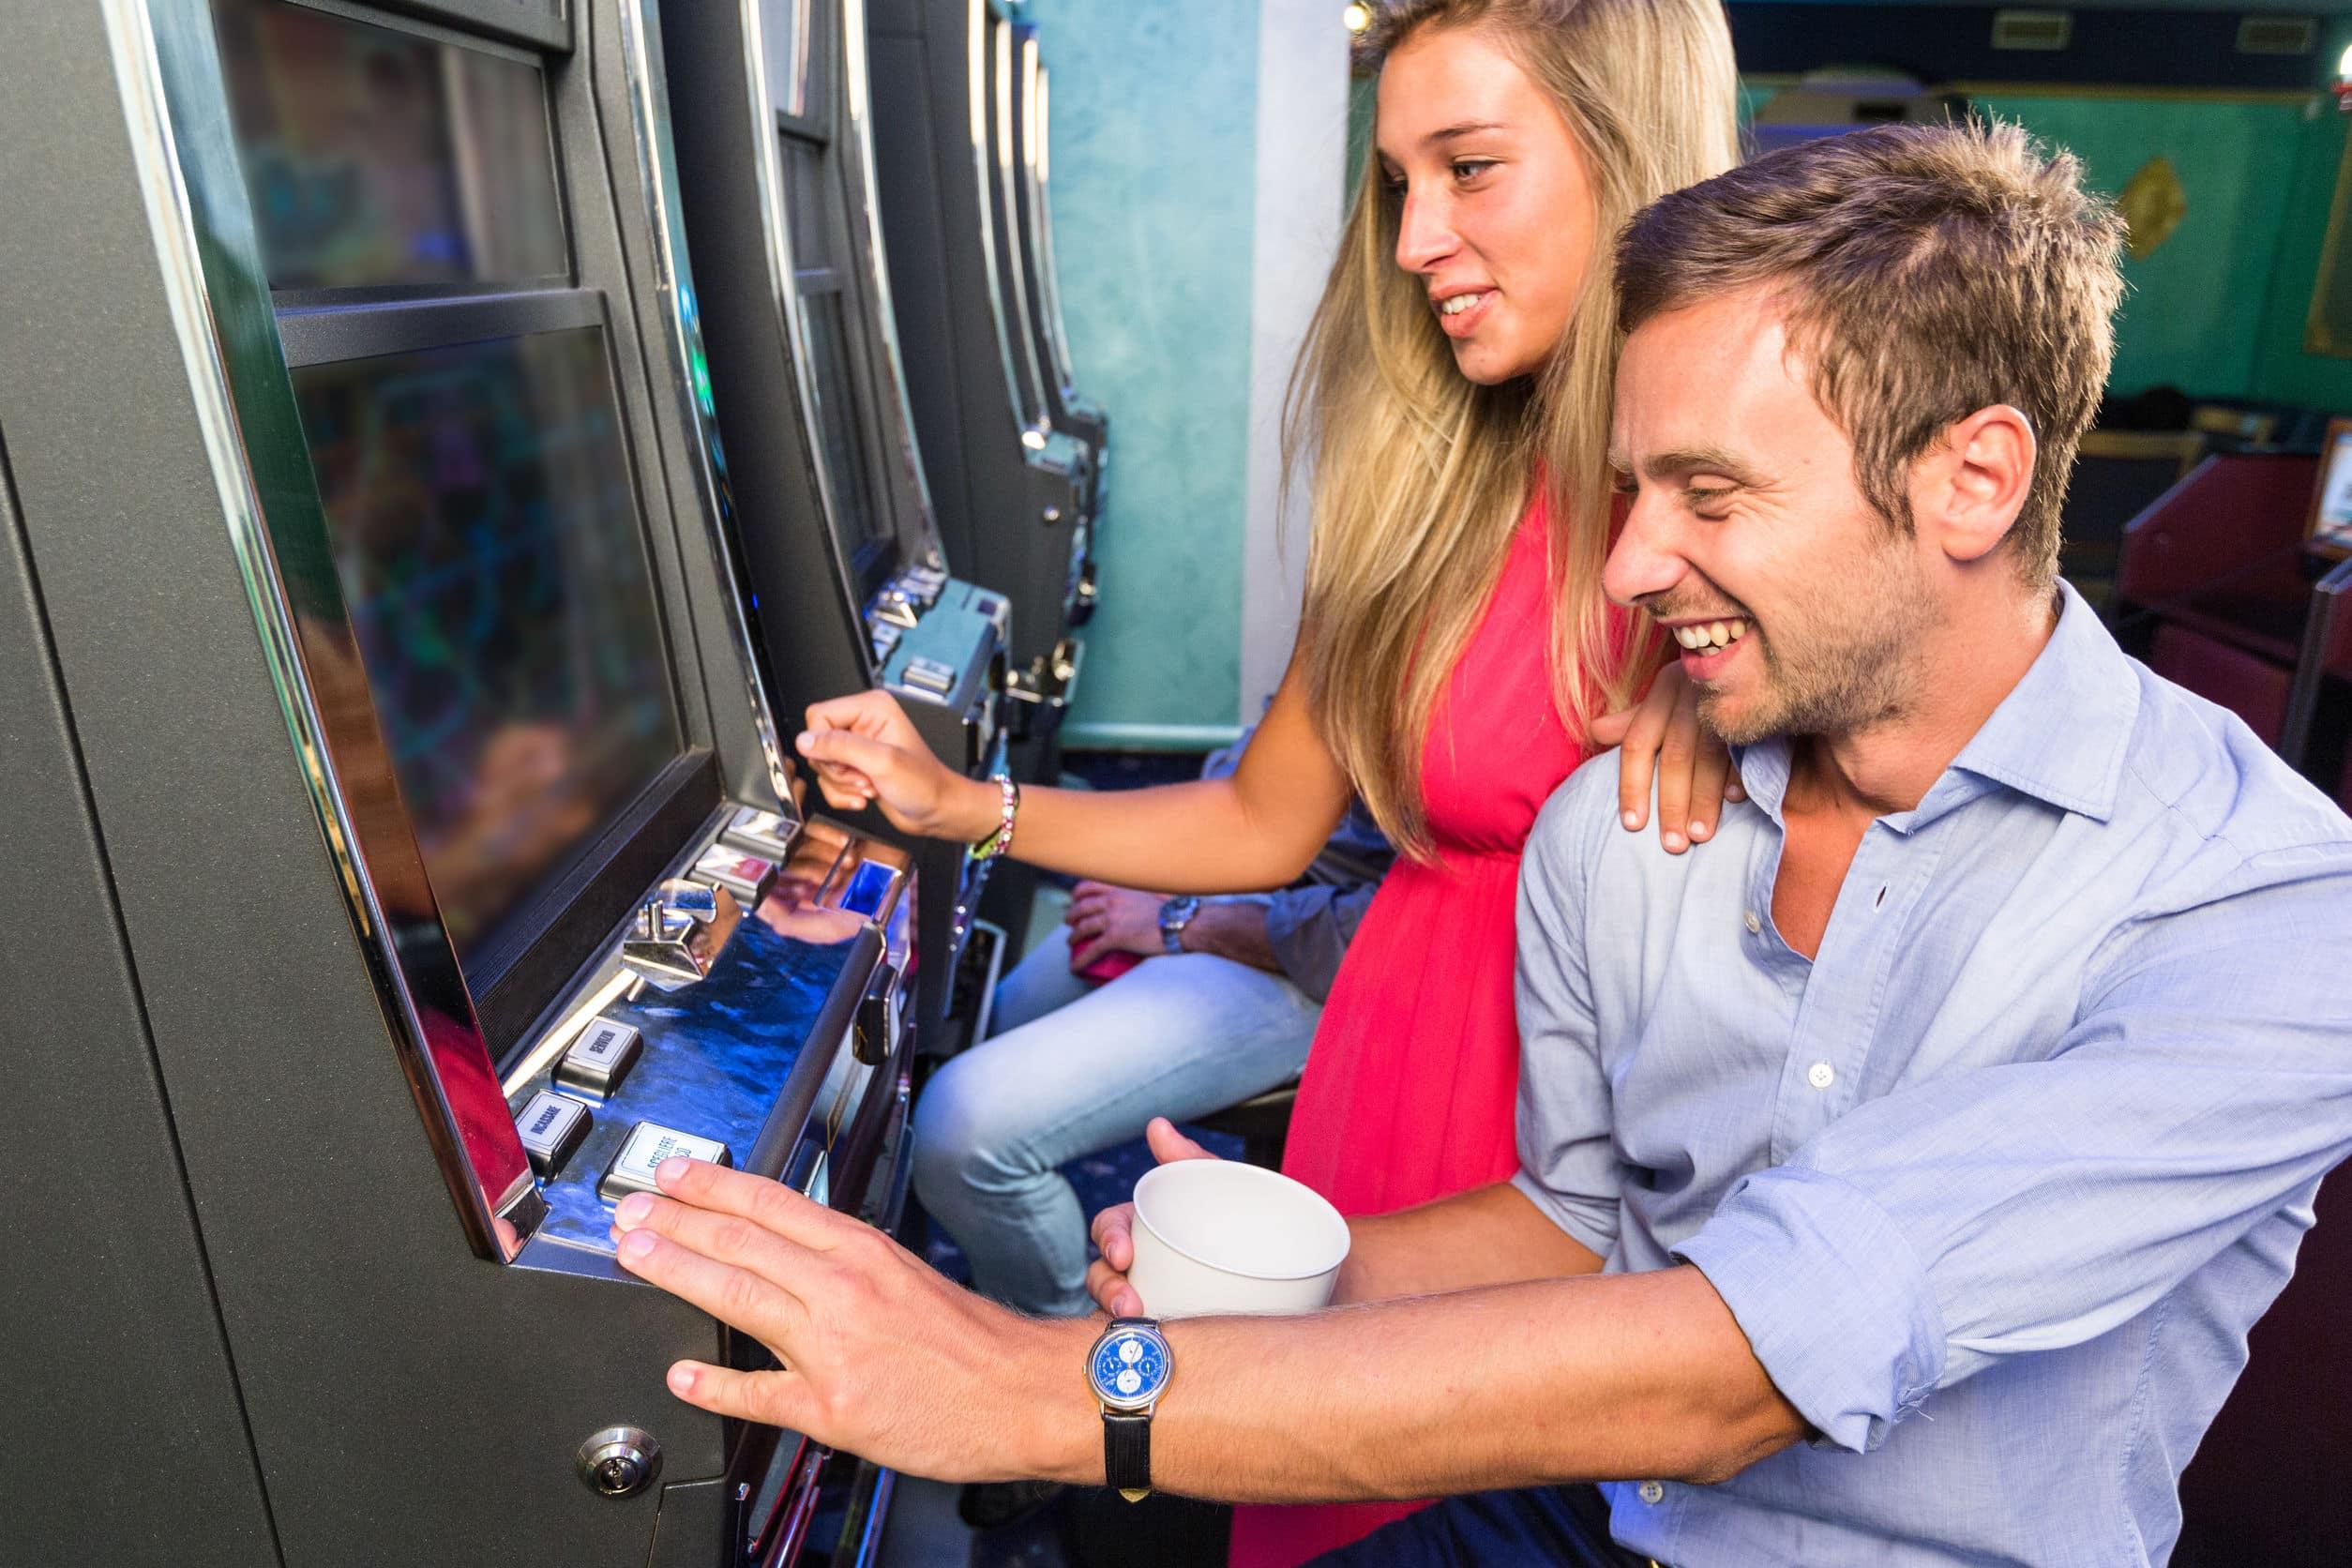 happy slots players